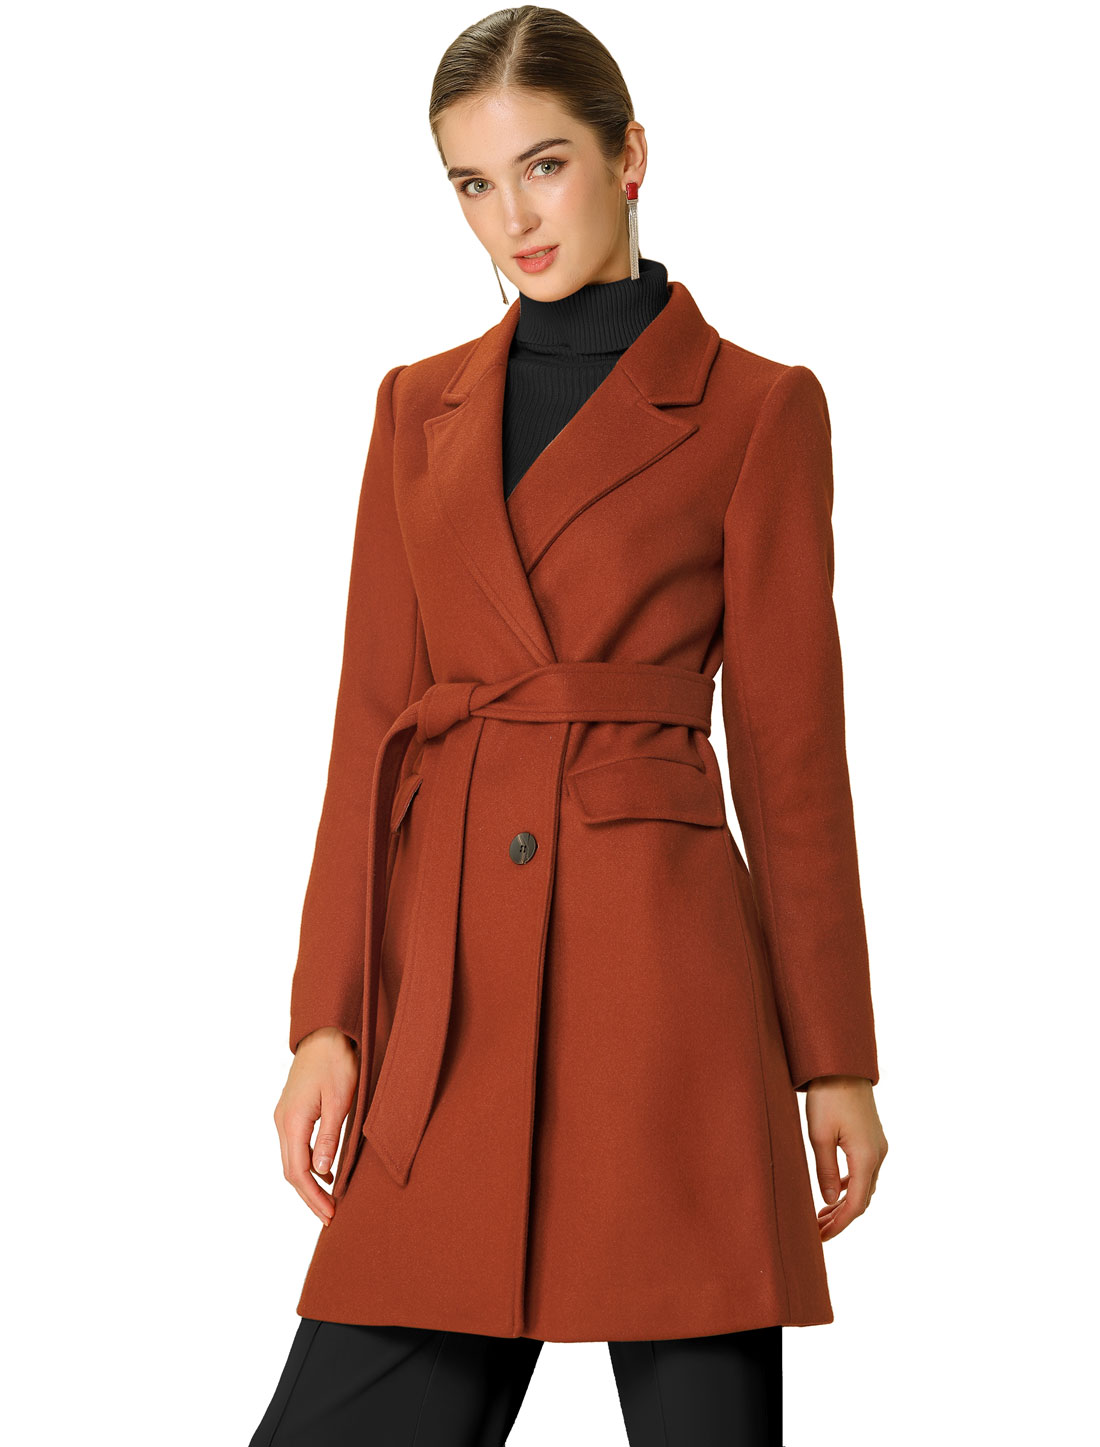 Allegra K Women's button Belt Long Jacket PeaTrench Coat Brick Red XS (US 2)